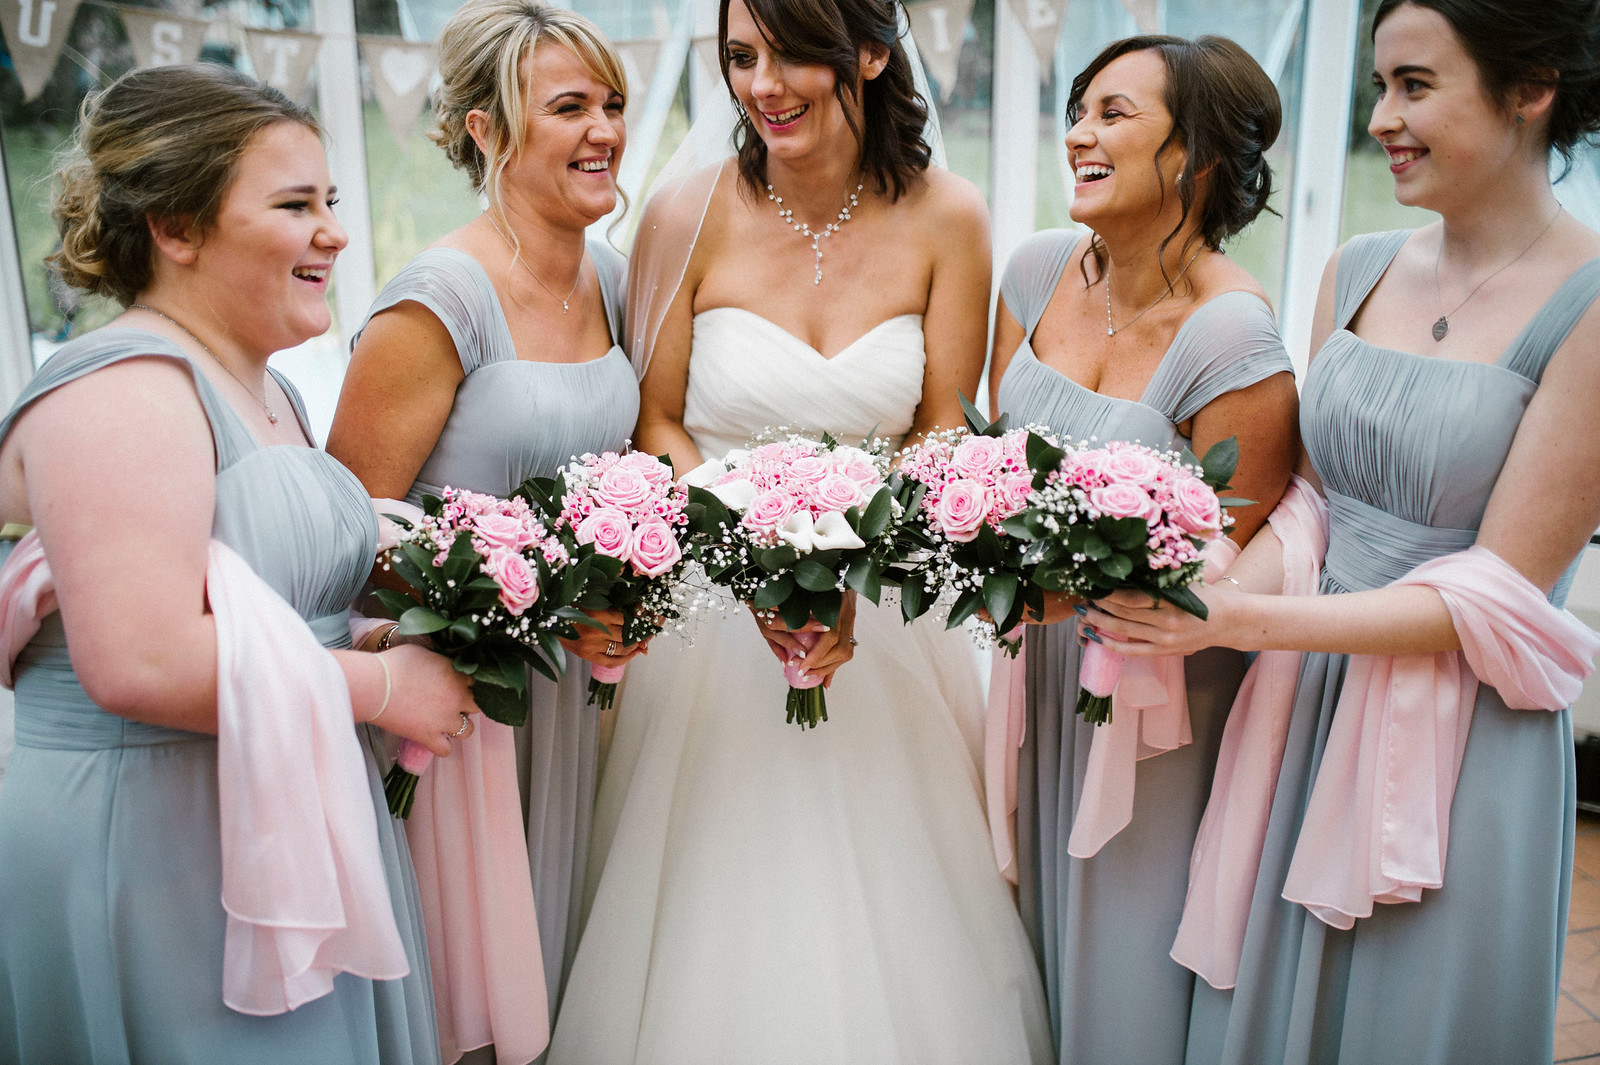 Bride and bridesmaids wedding photo - Full of smiles